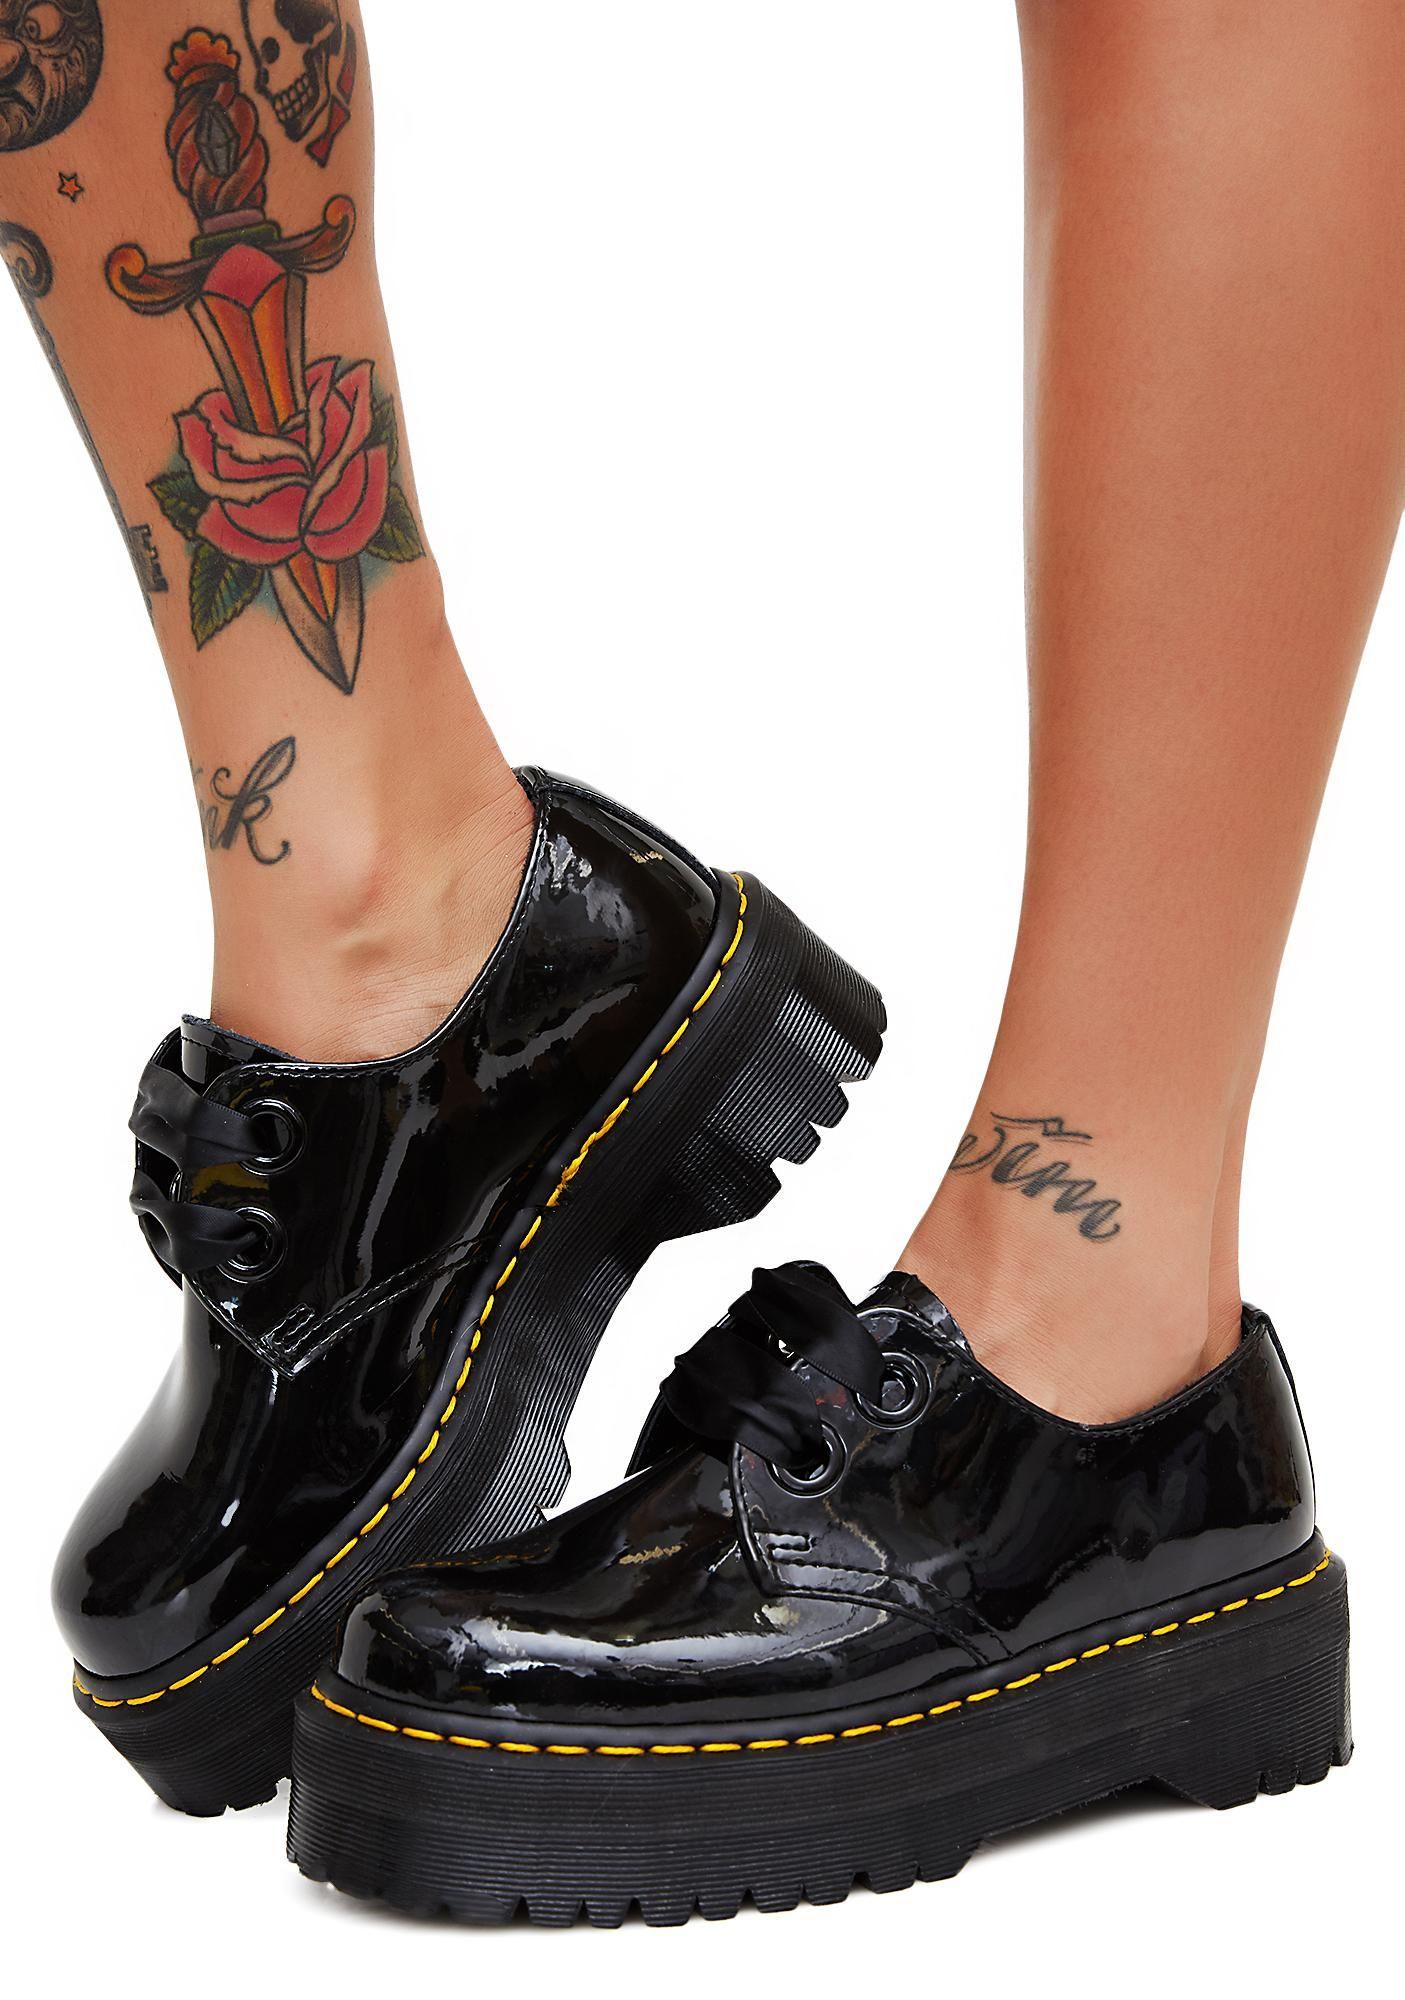 Details about Dr. Martens Women 1461 Quad Holly Style Black Rainbow Patent Platform ALL Sizes!